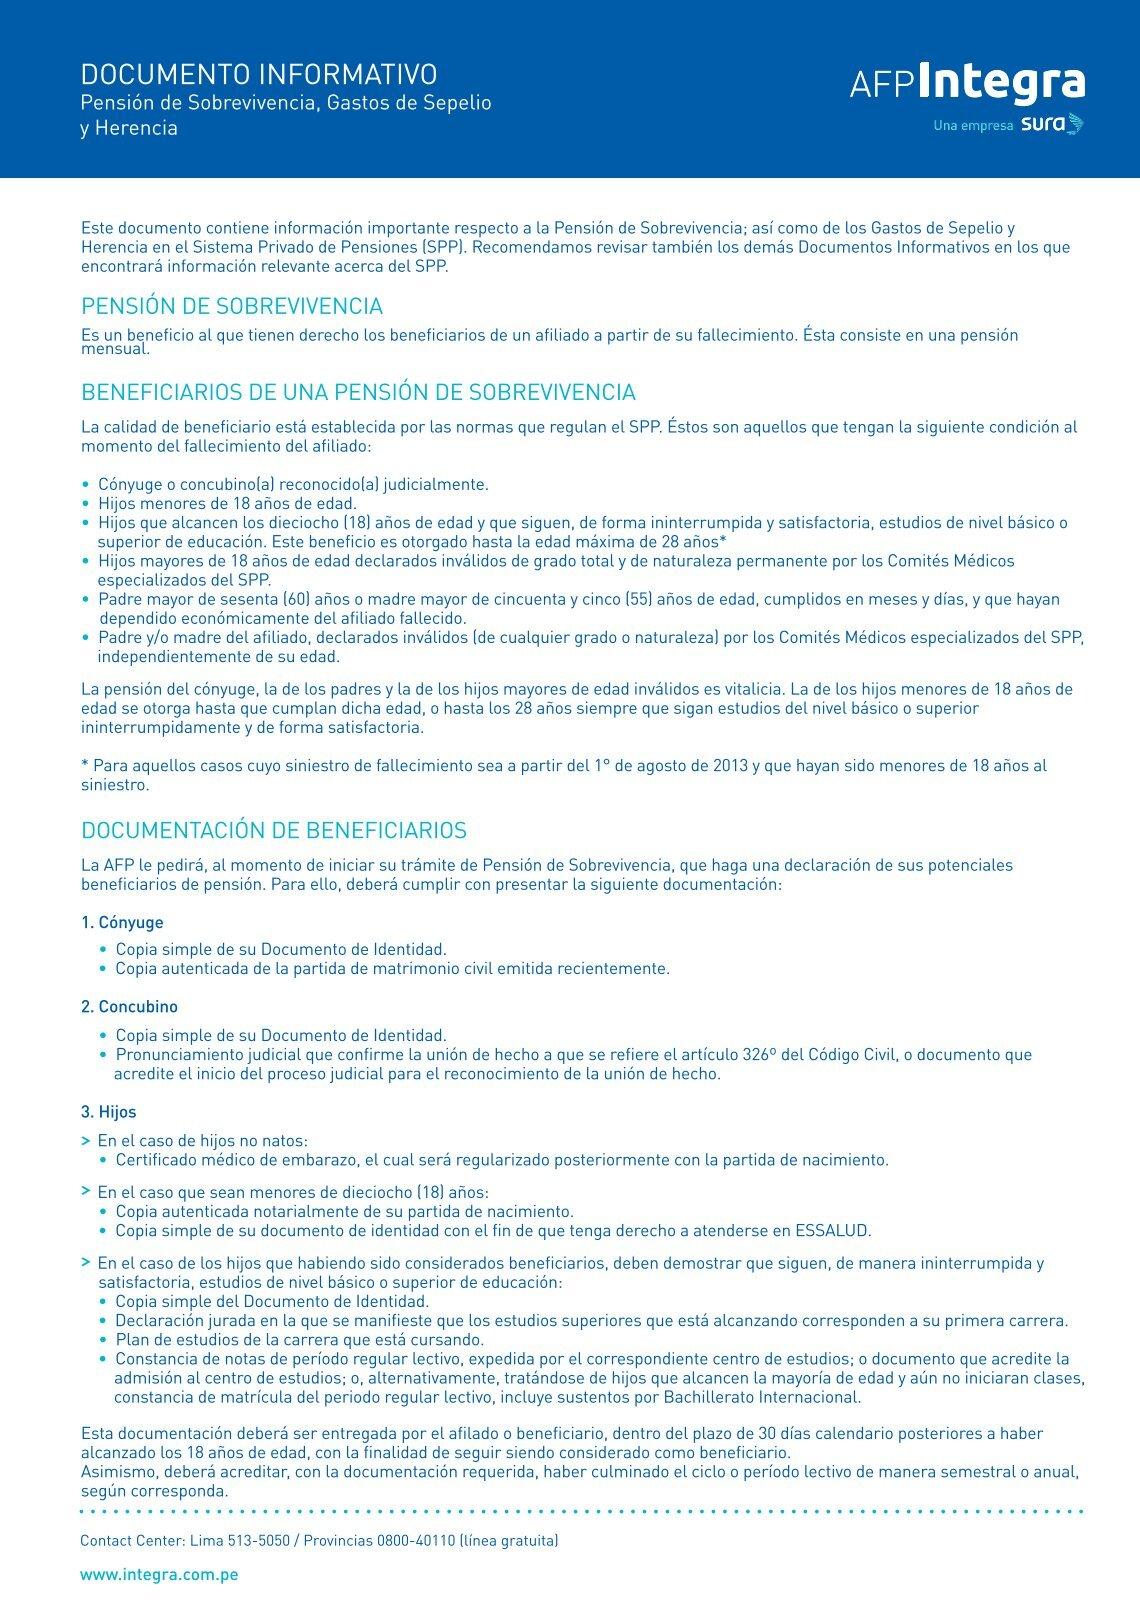 Famoso Certificado De Nacimiento De Sudáfrica íntegra Cresta - Cómo ...